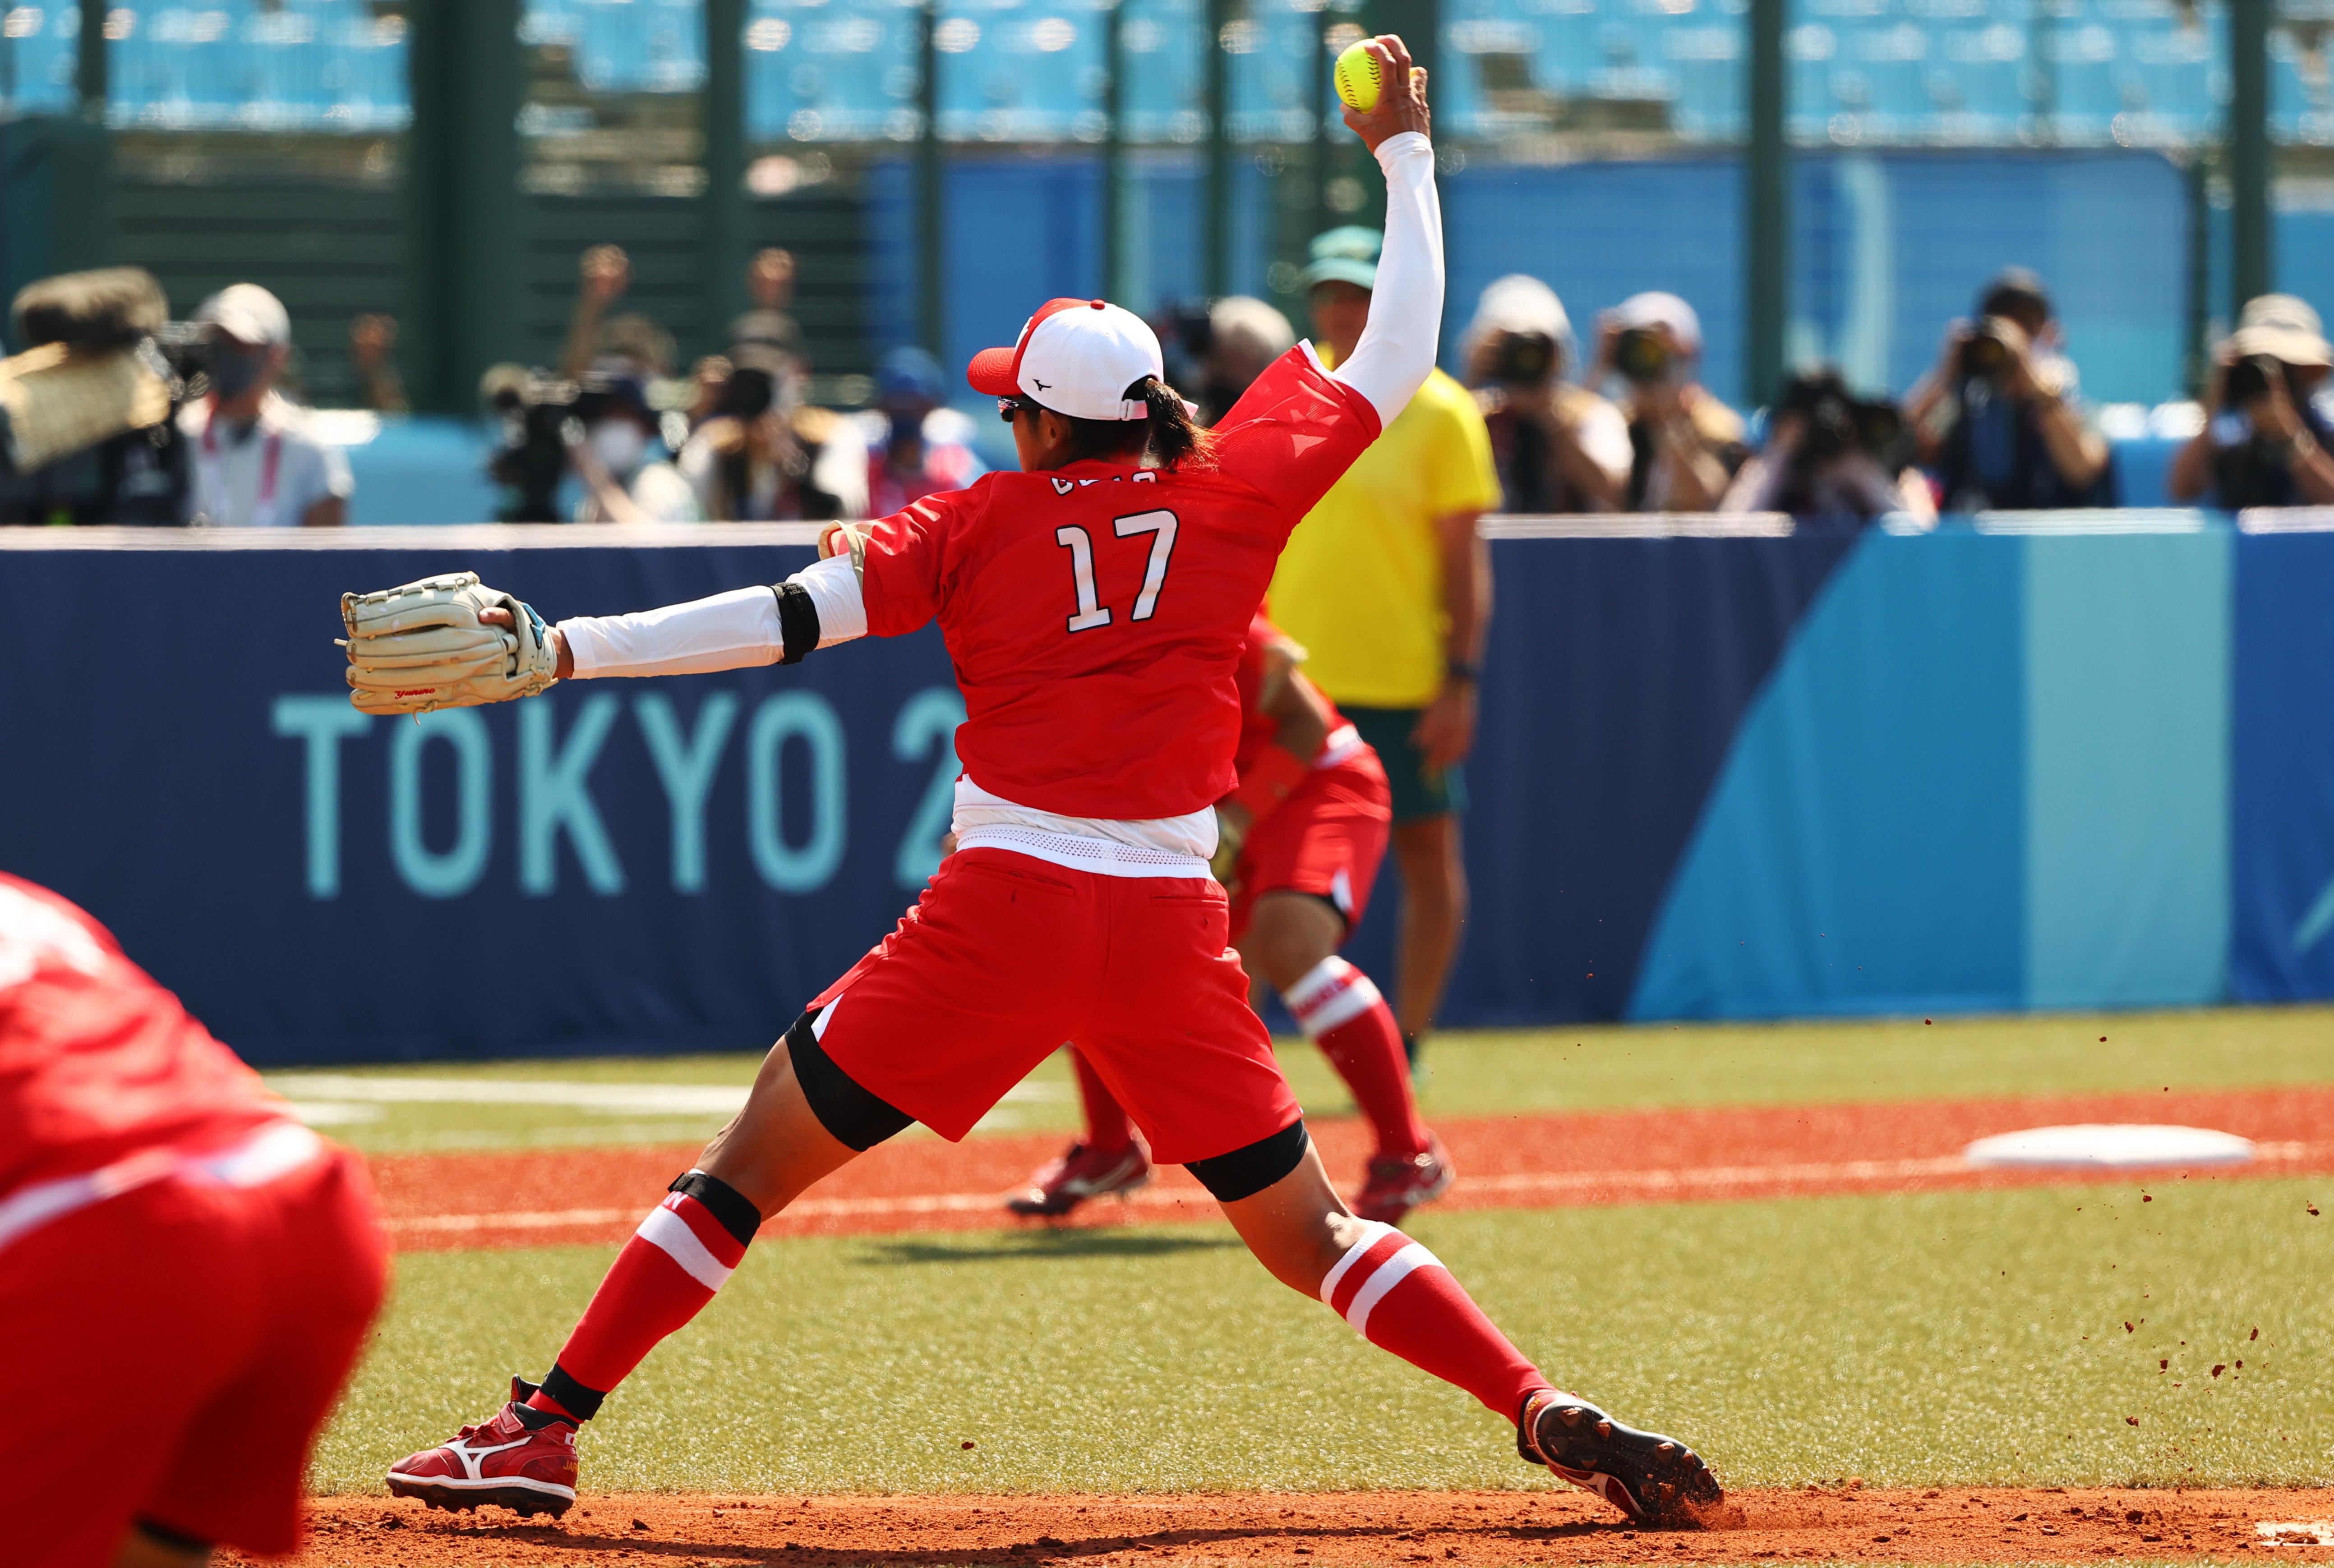 Tokyo 2020 Olympics - Softball - Women - Opening Round - Australia v Japan - Fukushima Azuma Baseball Stadium - Fukushima, Japan - July 21, 2021. Yukiko Ueno of Japan in action. REUTERS/Jorge Silva